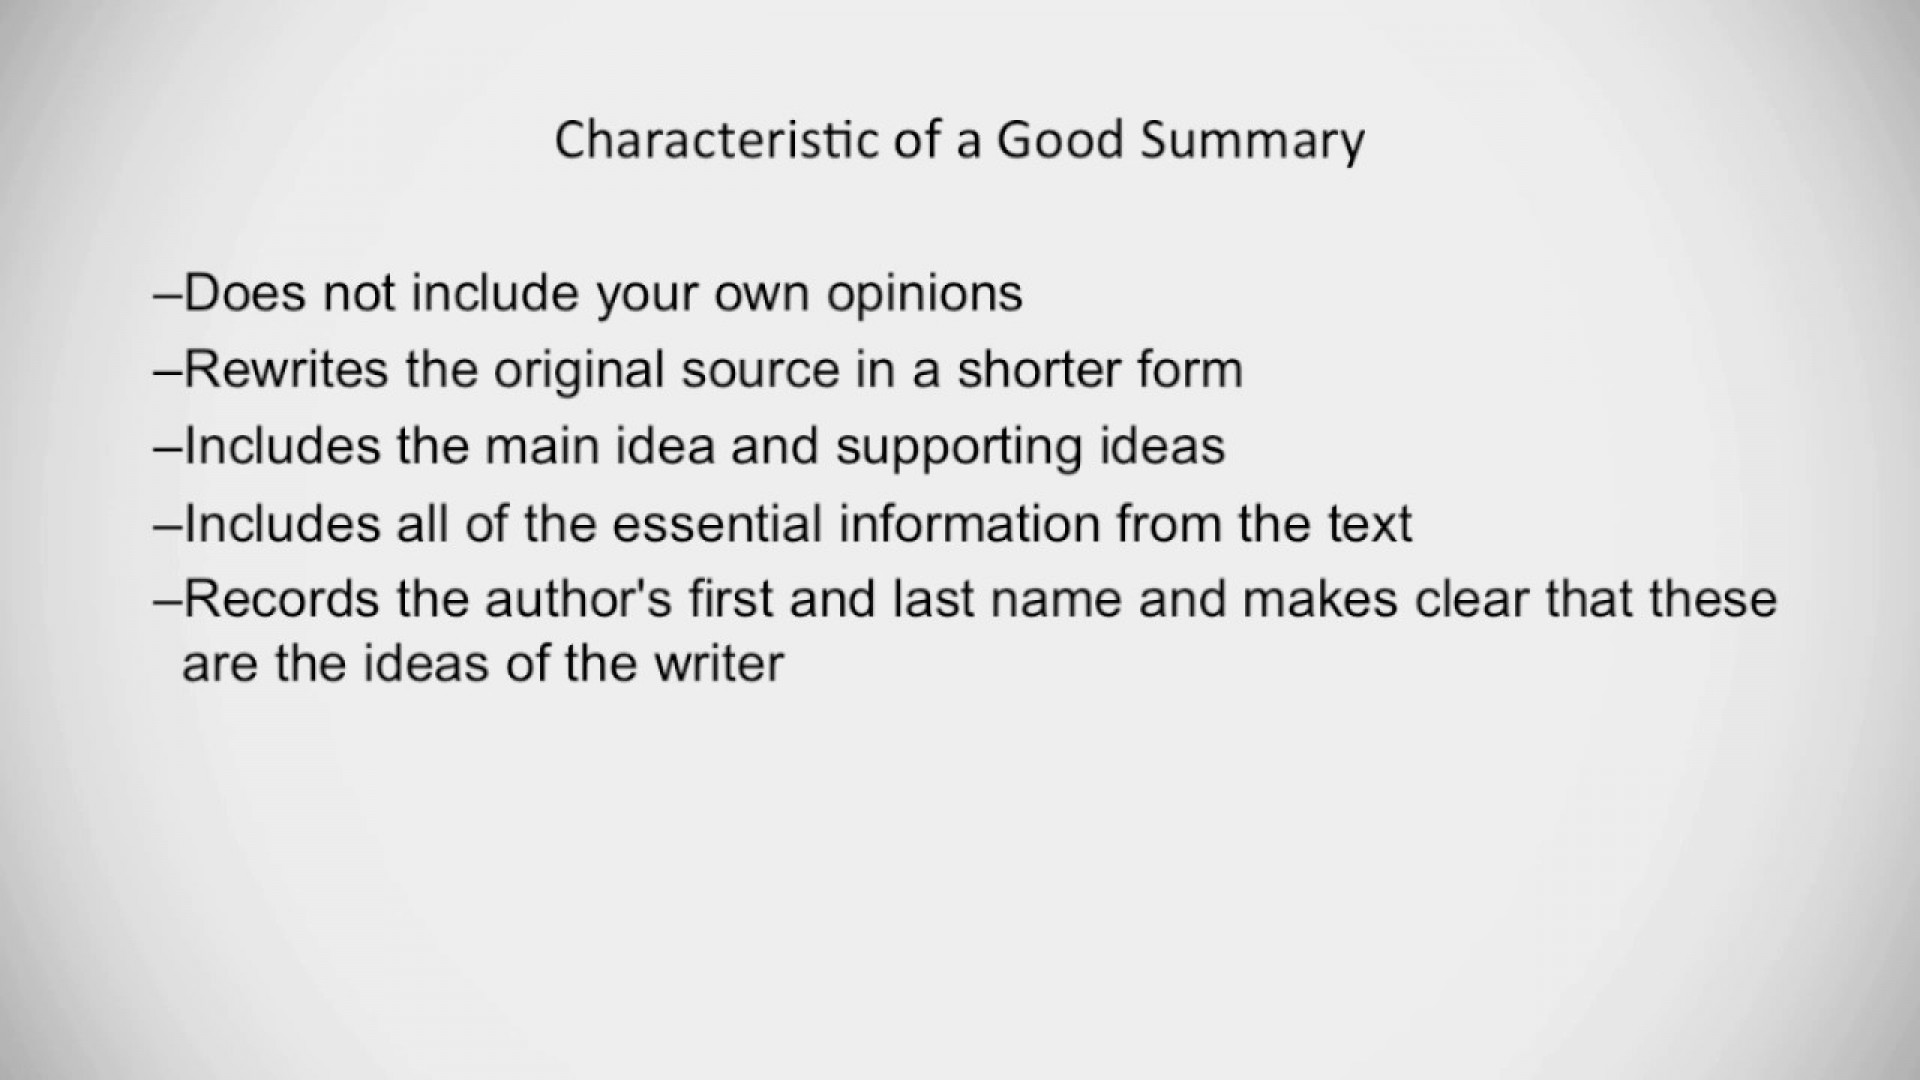 011 Essay Example Response Impressive Reader Definition Summary Topics Prompts 1920